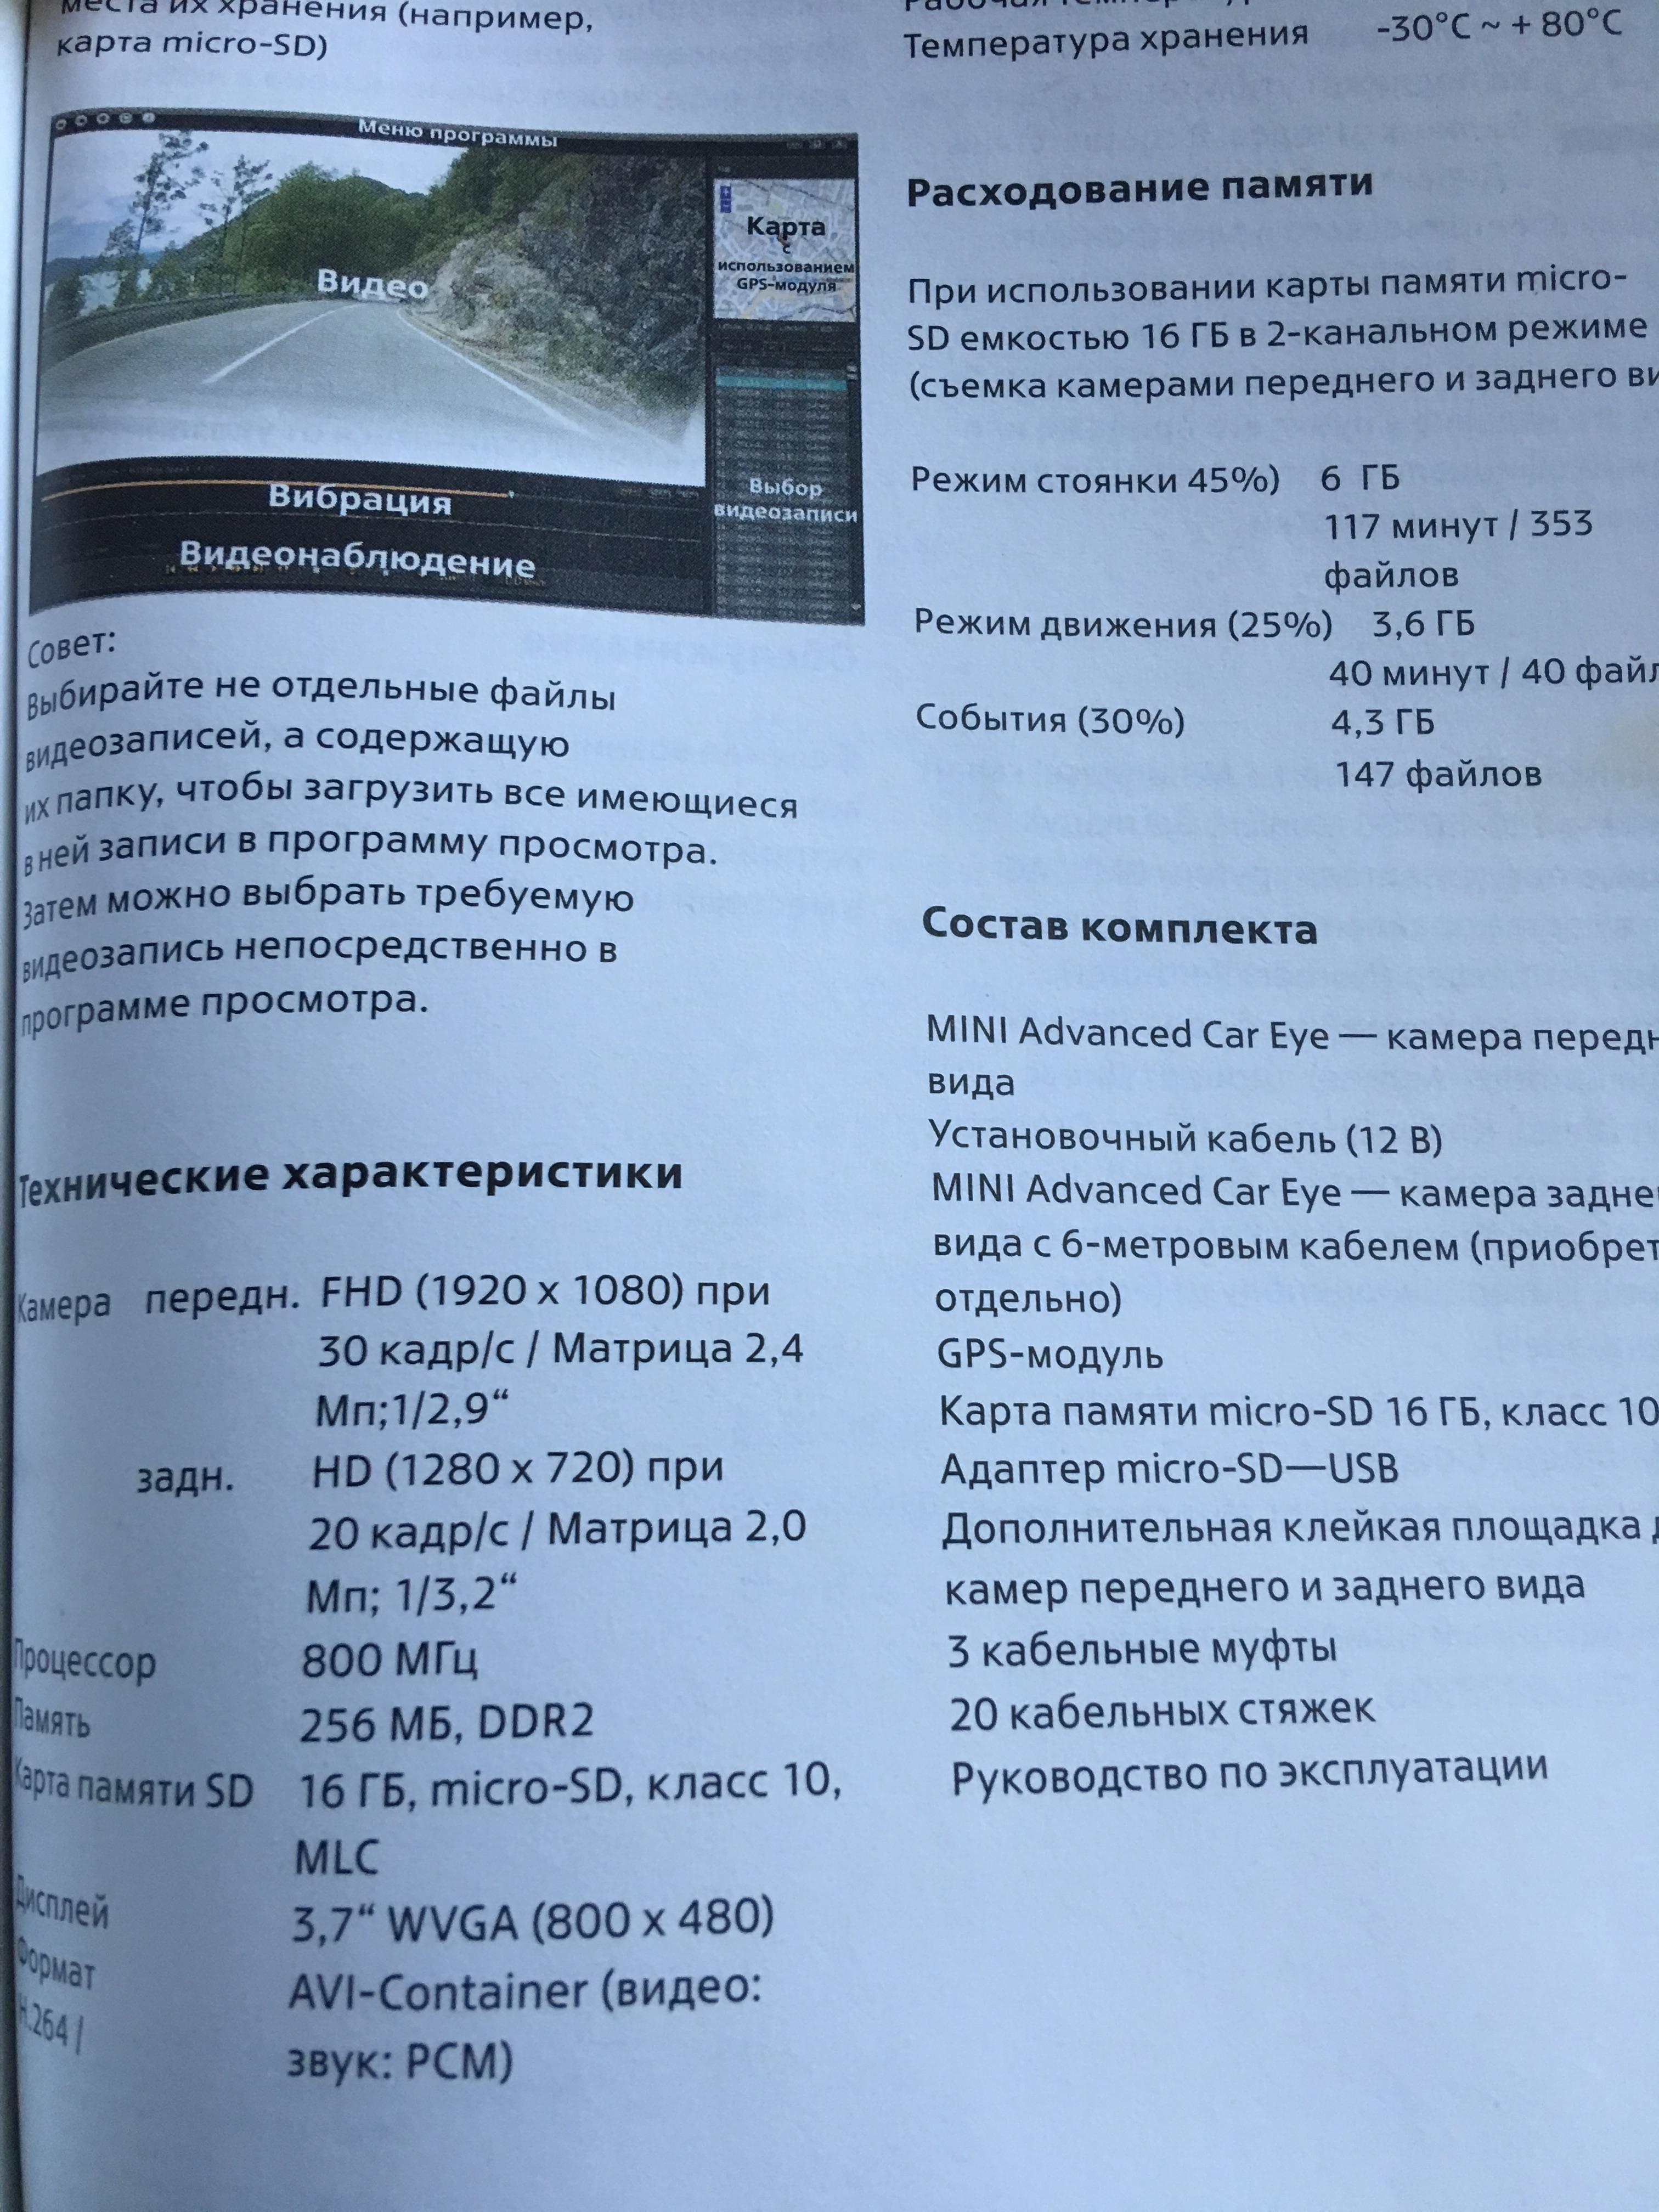 Prodam Novyj Videoregistrator Mini Advanced Car Eye 66 21 2 364 602